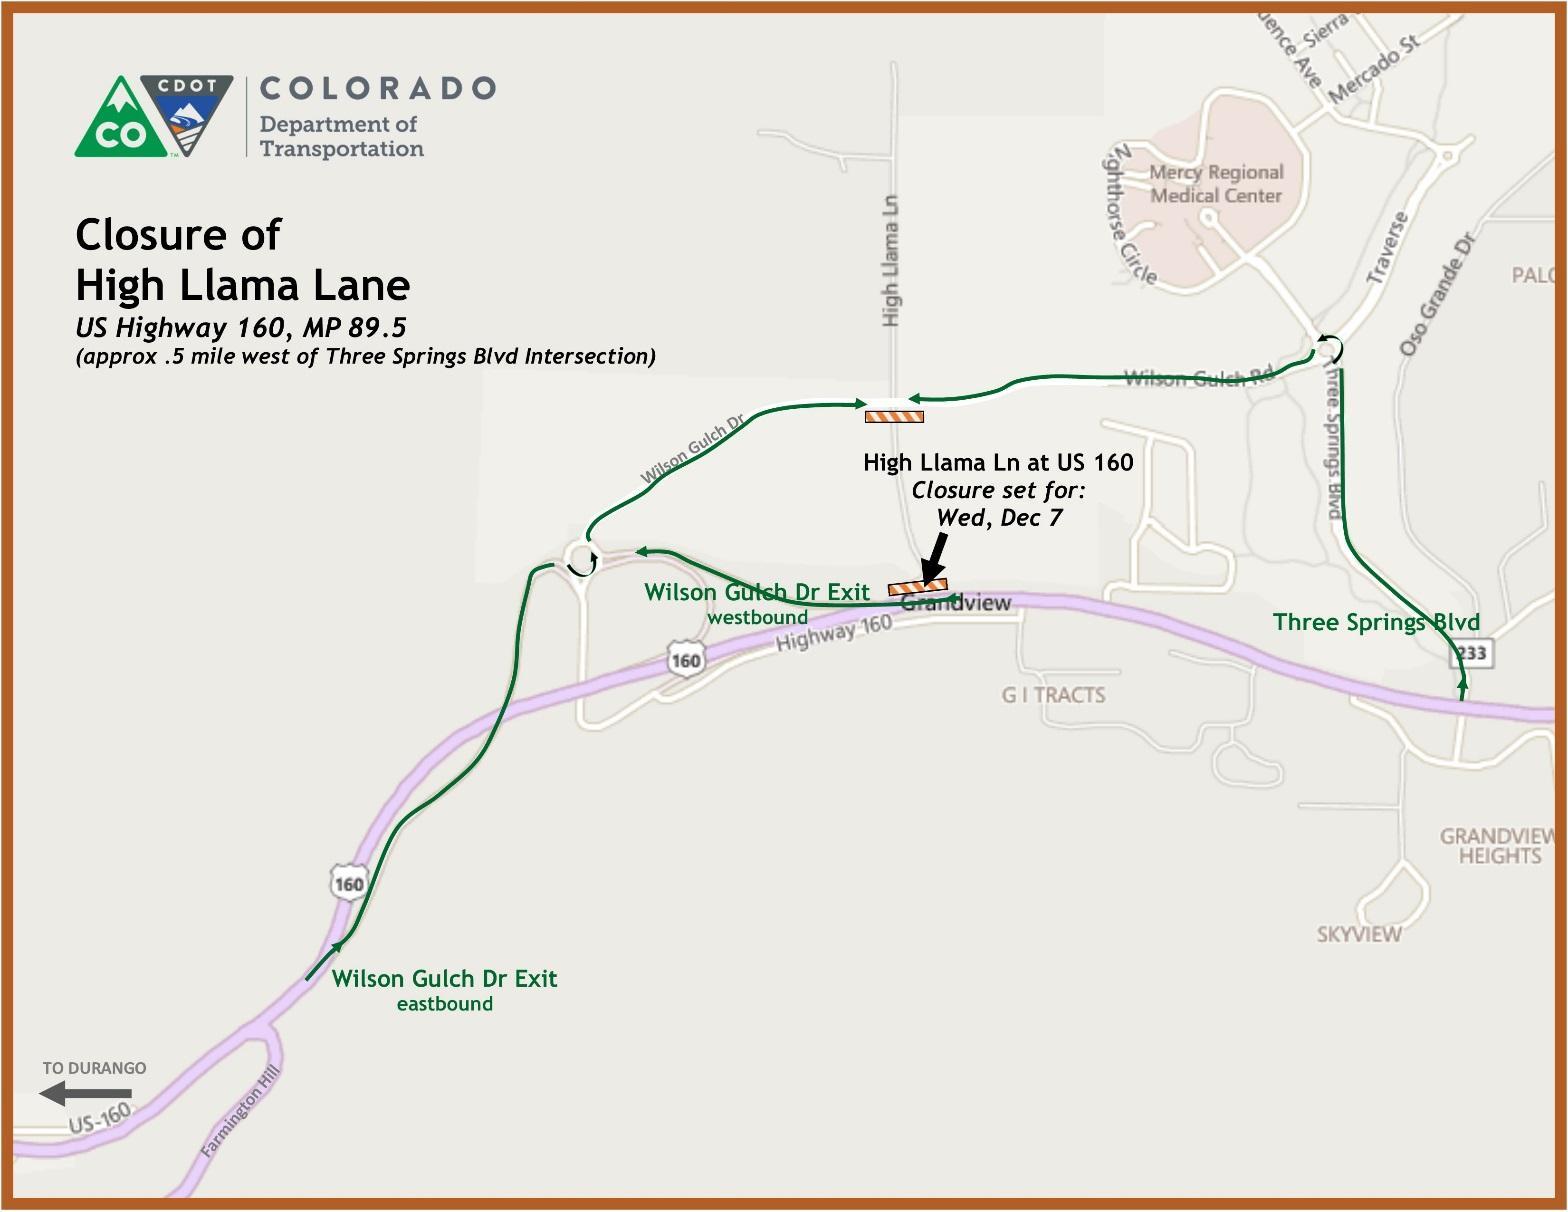 High Llama Lane Closure